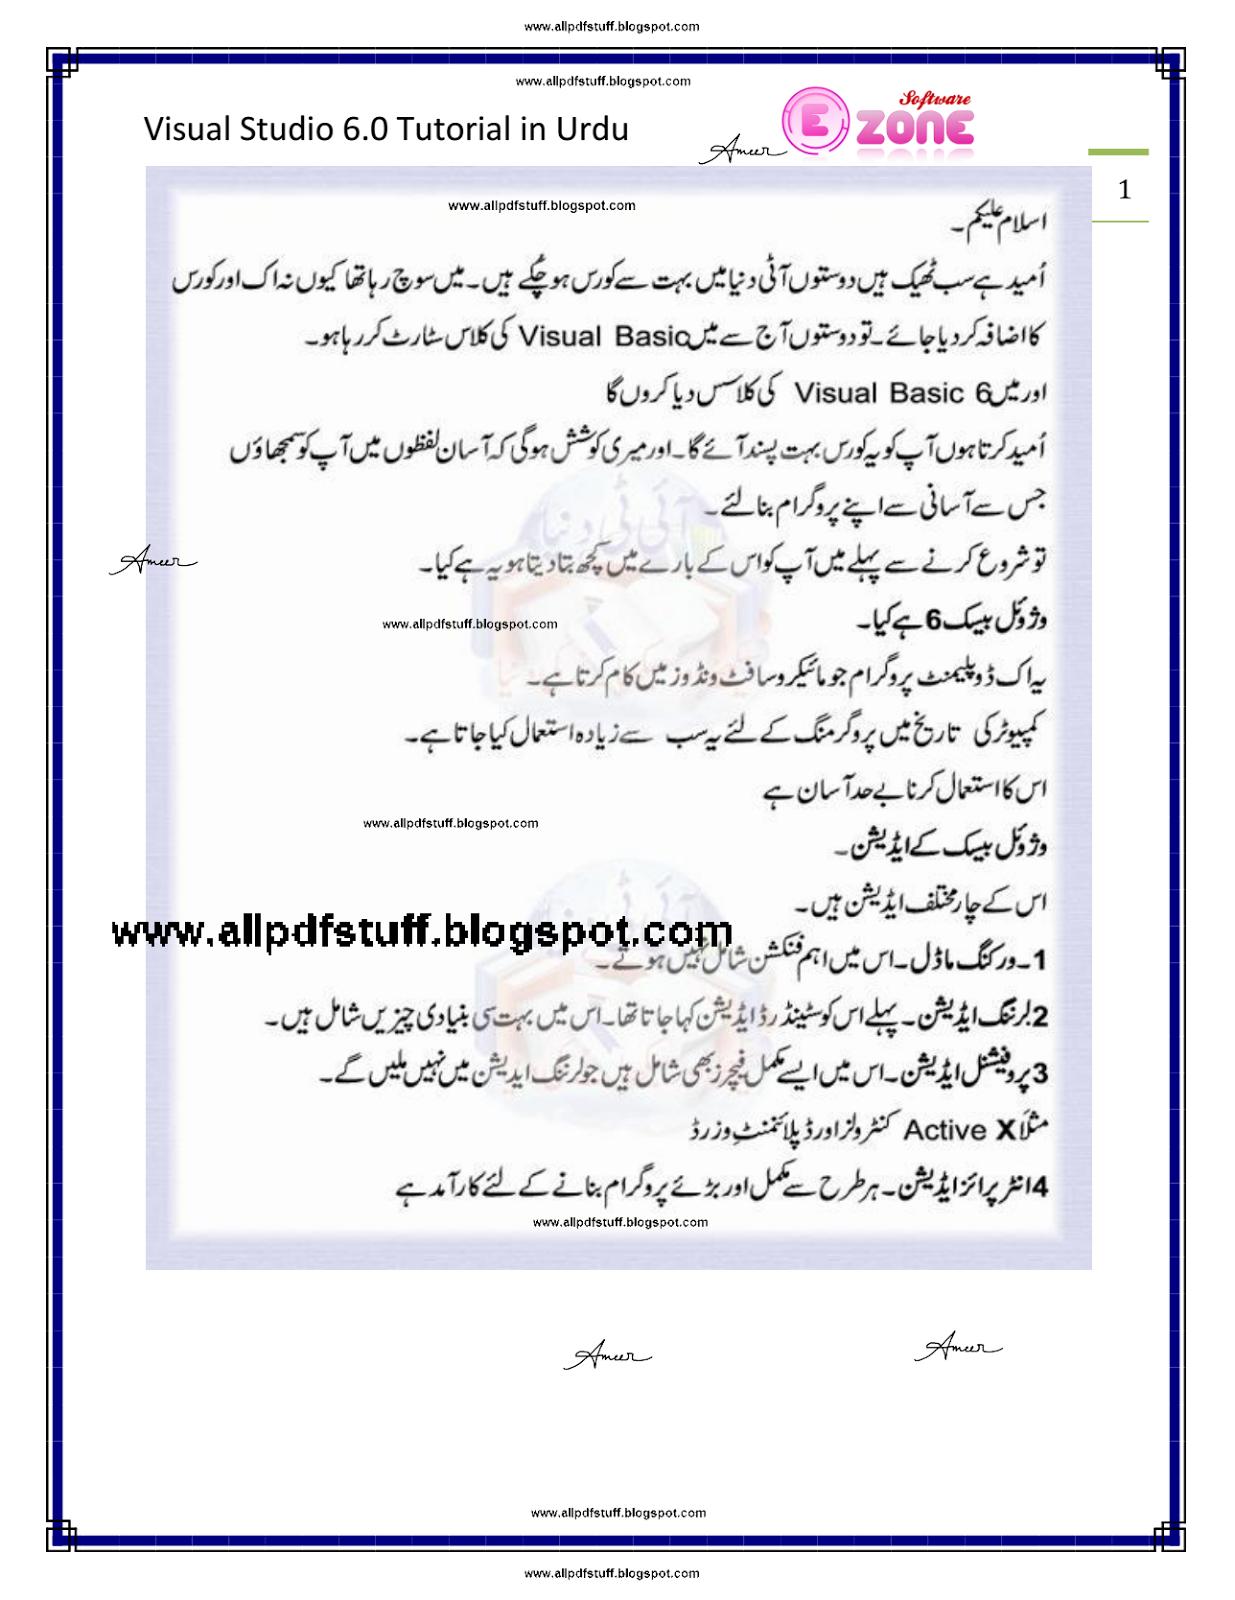 Web development courses in urdu pdf / Rcn coin 4chan jennifer